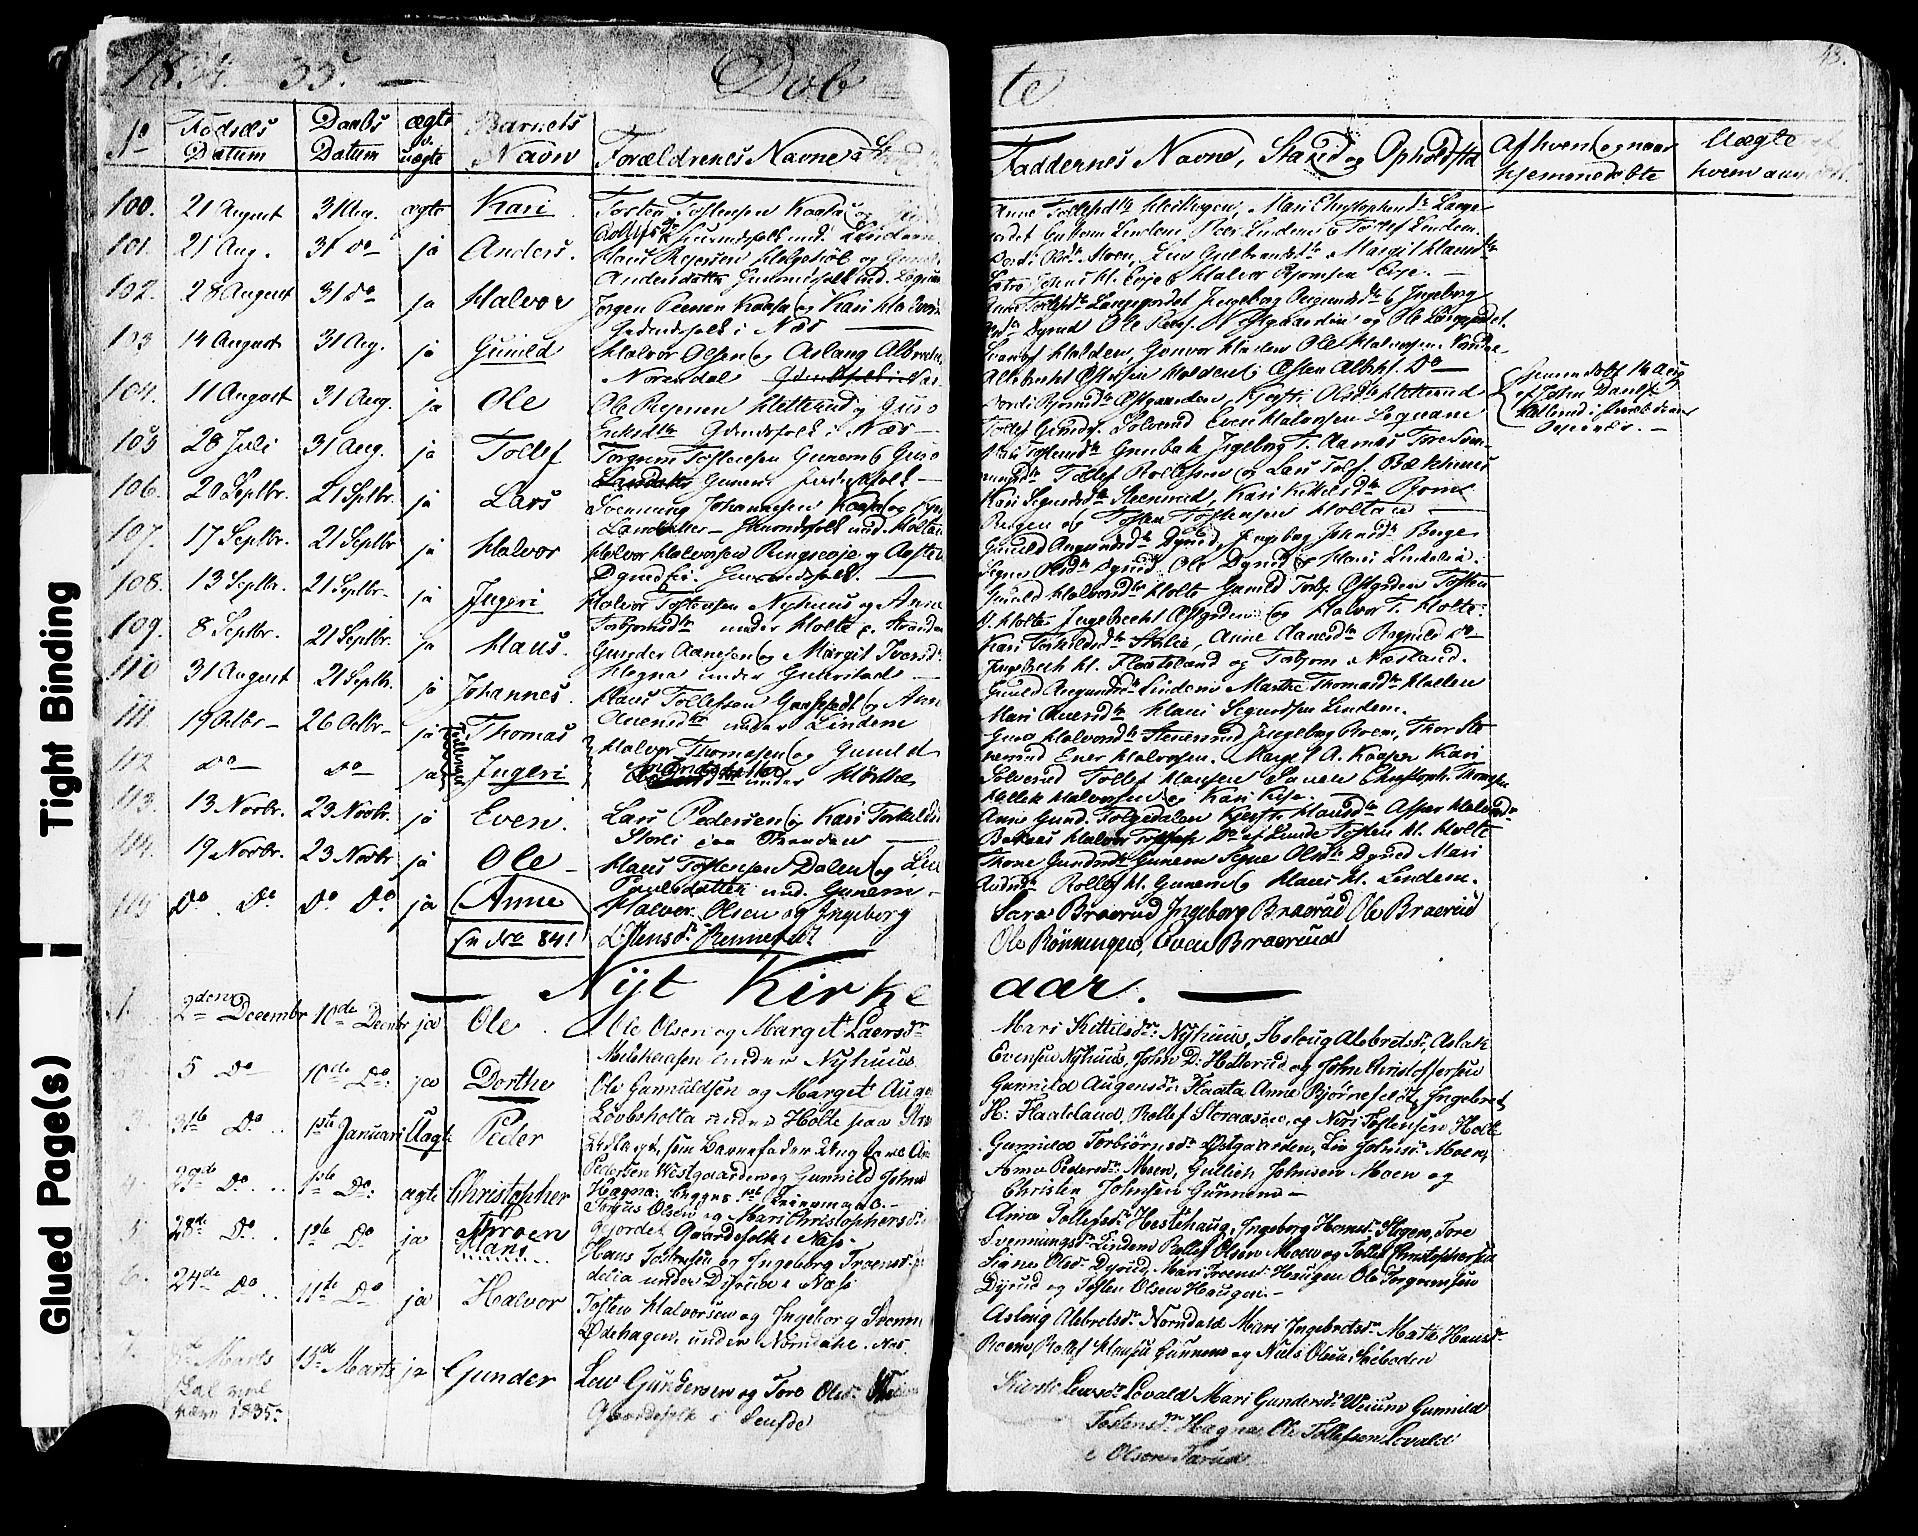 SAKO, Sauherad kirkebøker, F/Fa/L0006: Ministerialbok nr. I 6, 1827-1850, s. 48